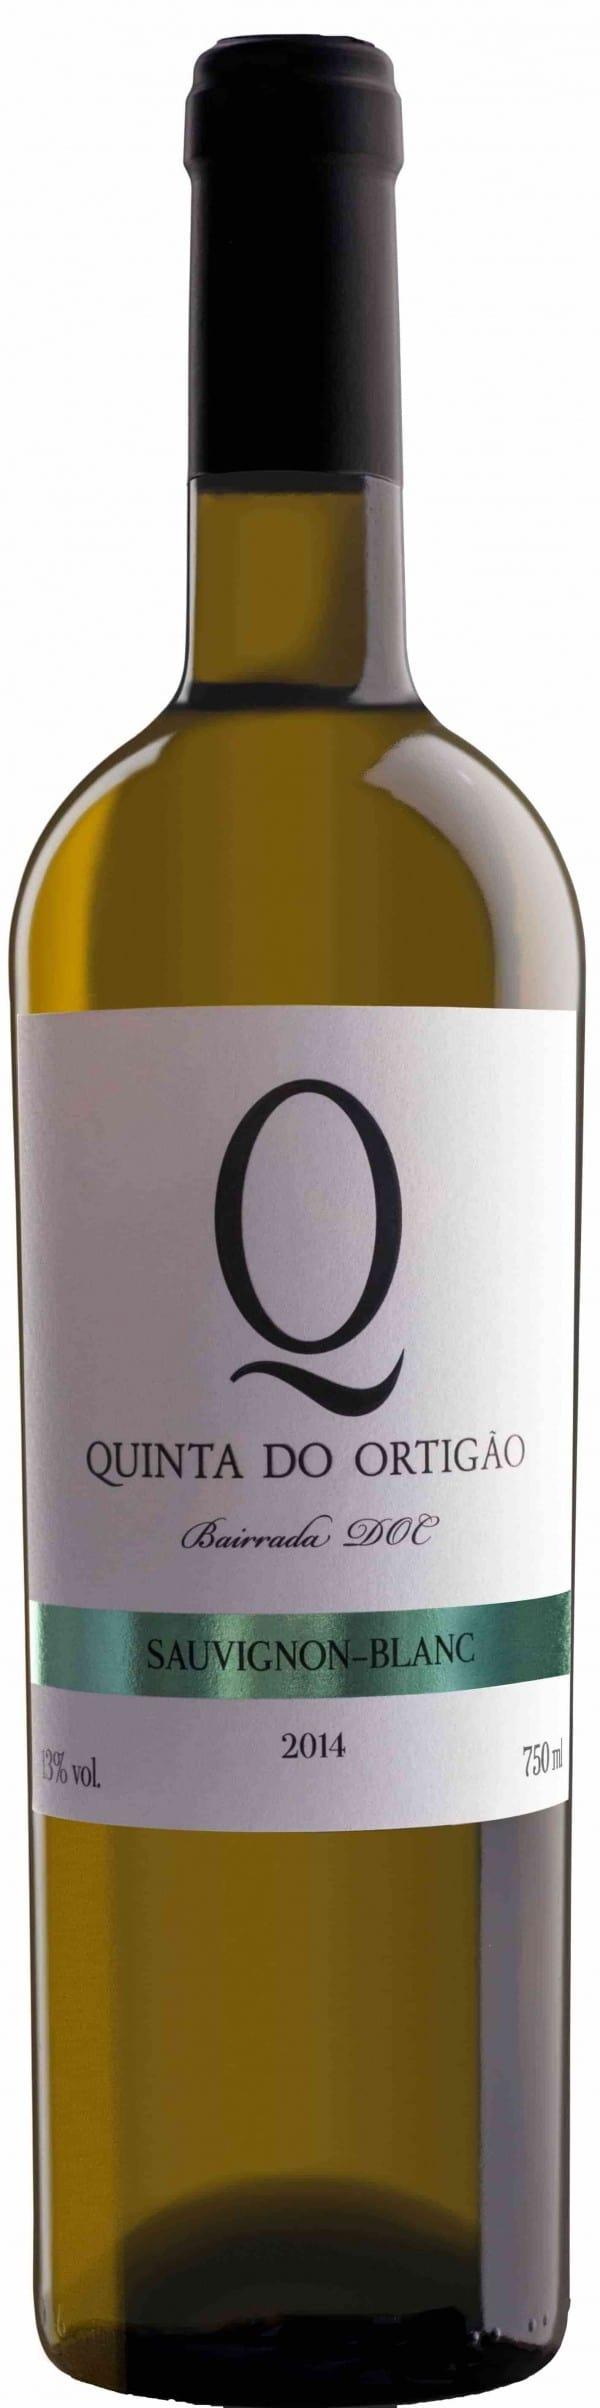 Portugalské víno Quinta do Ortigão Sauvignon Blanc na eshopu vín z Portugalska